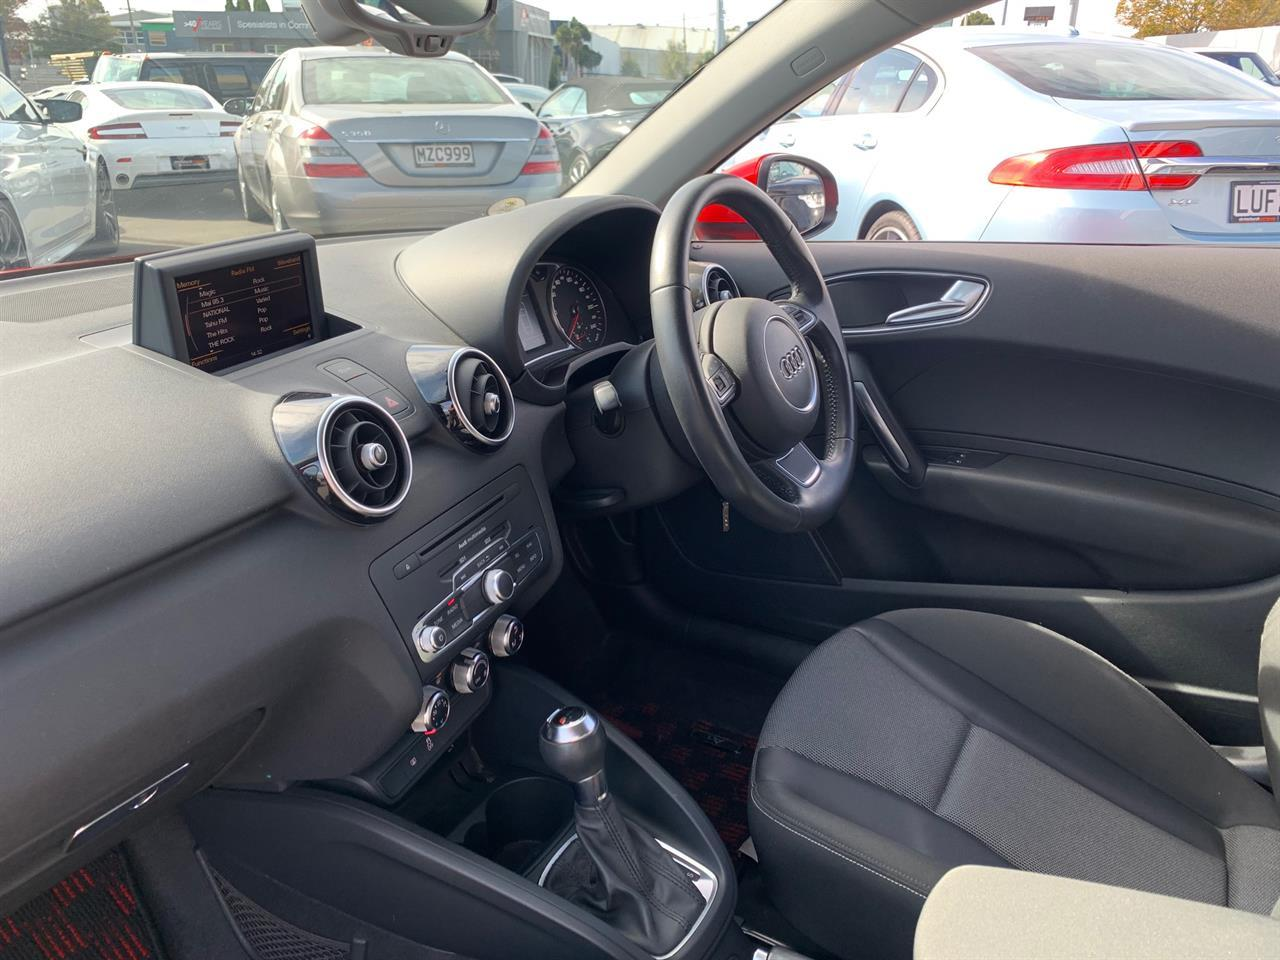 image-7, 2011 Audi A1 1.4 TSI 7 Speed at Christchurch